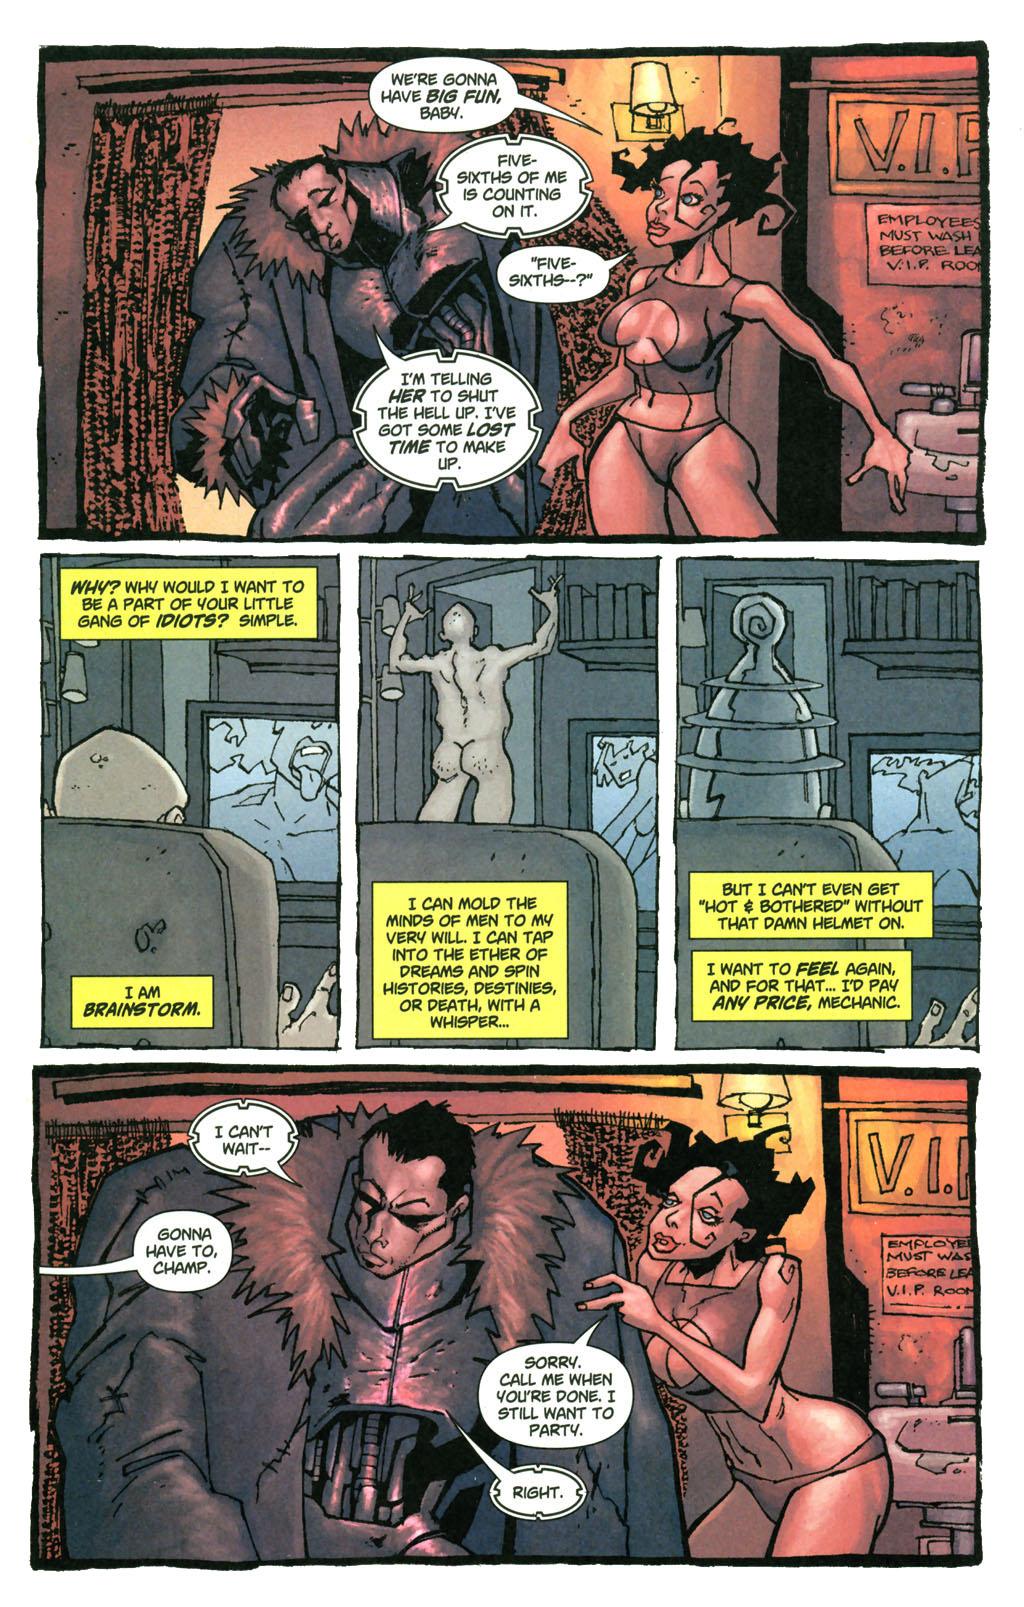 Read online Enginehead comic -  Issue #4 - 9